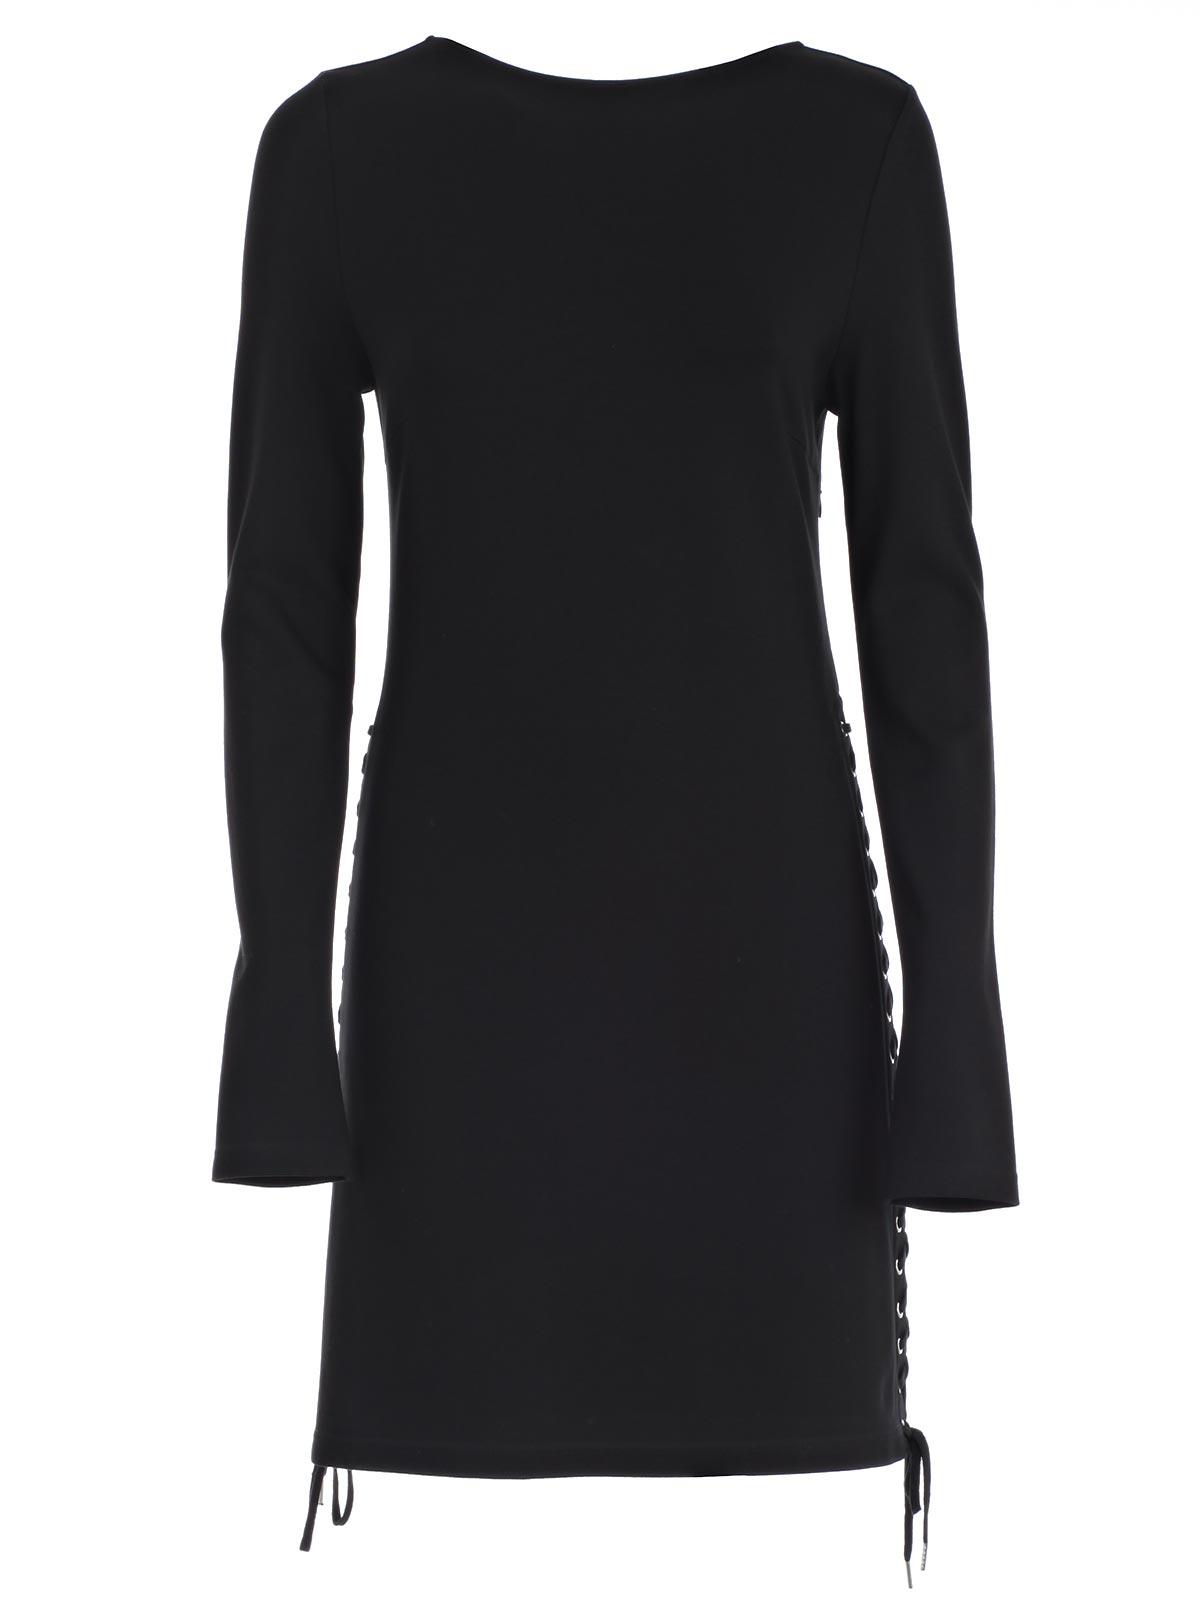 Picture of MCQ ALEXANDER MCQUEEN DRESS